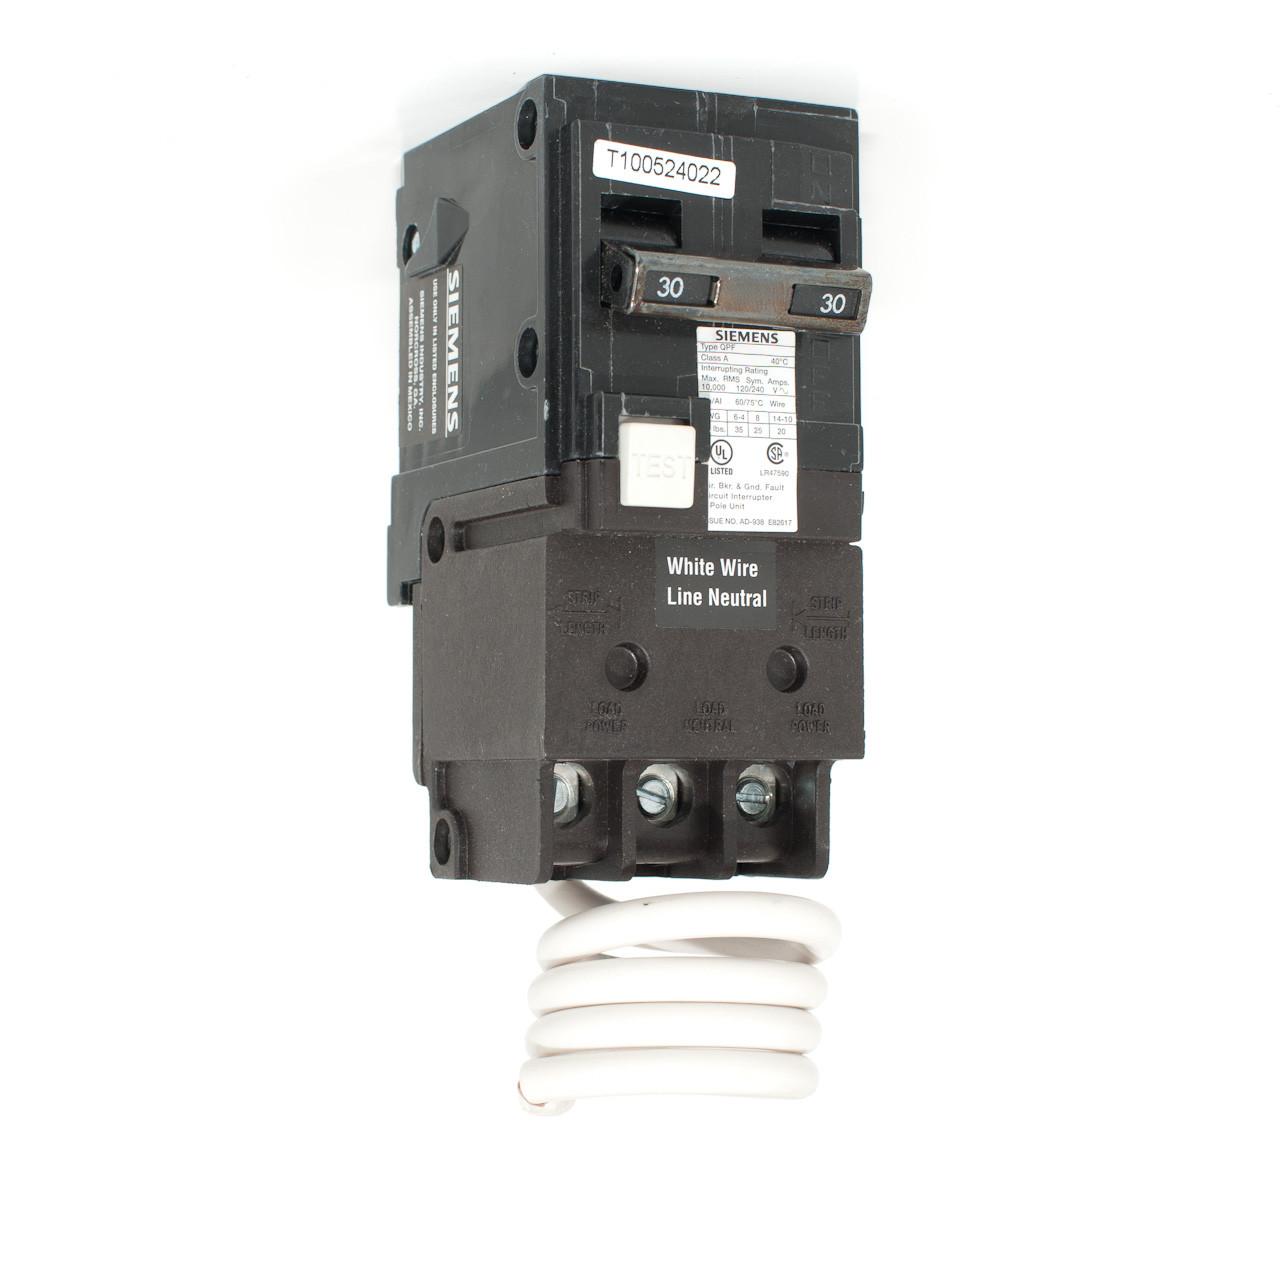 Siemens 30A Two Pole GFCI Push-On Breaker - TremTech ...